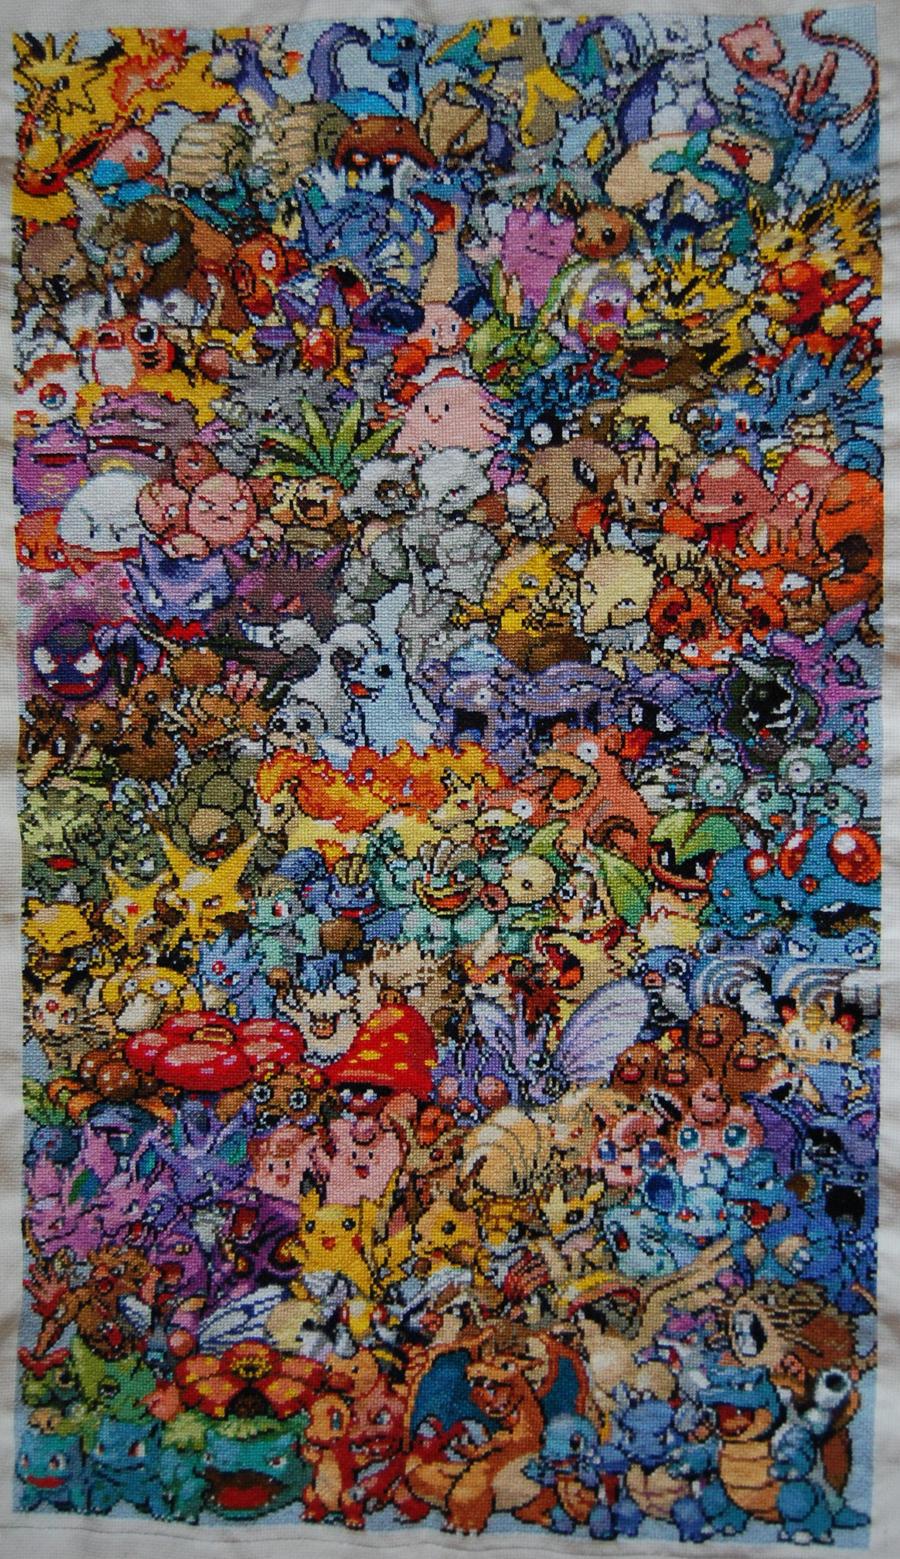 Finished Epic Pokemon Cross Stitch by sfxbecks